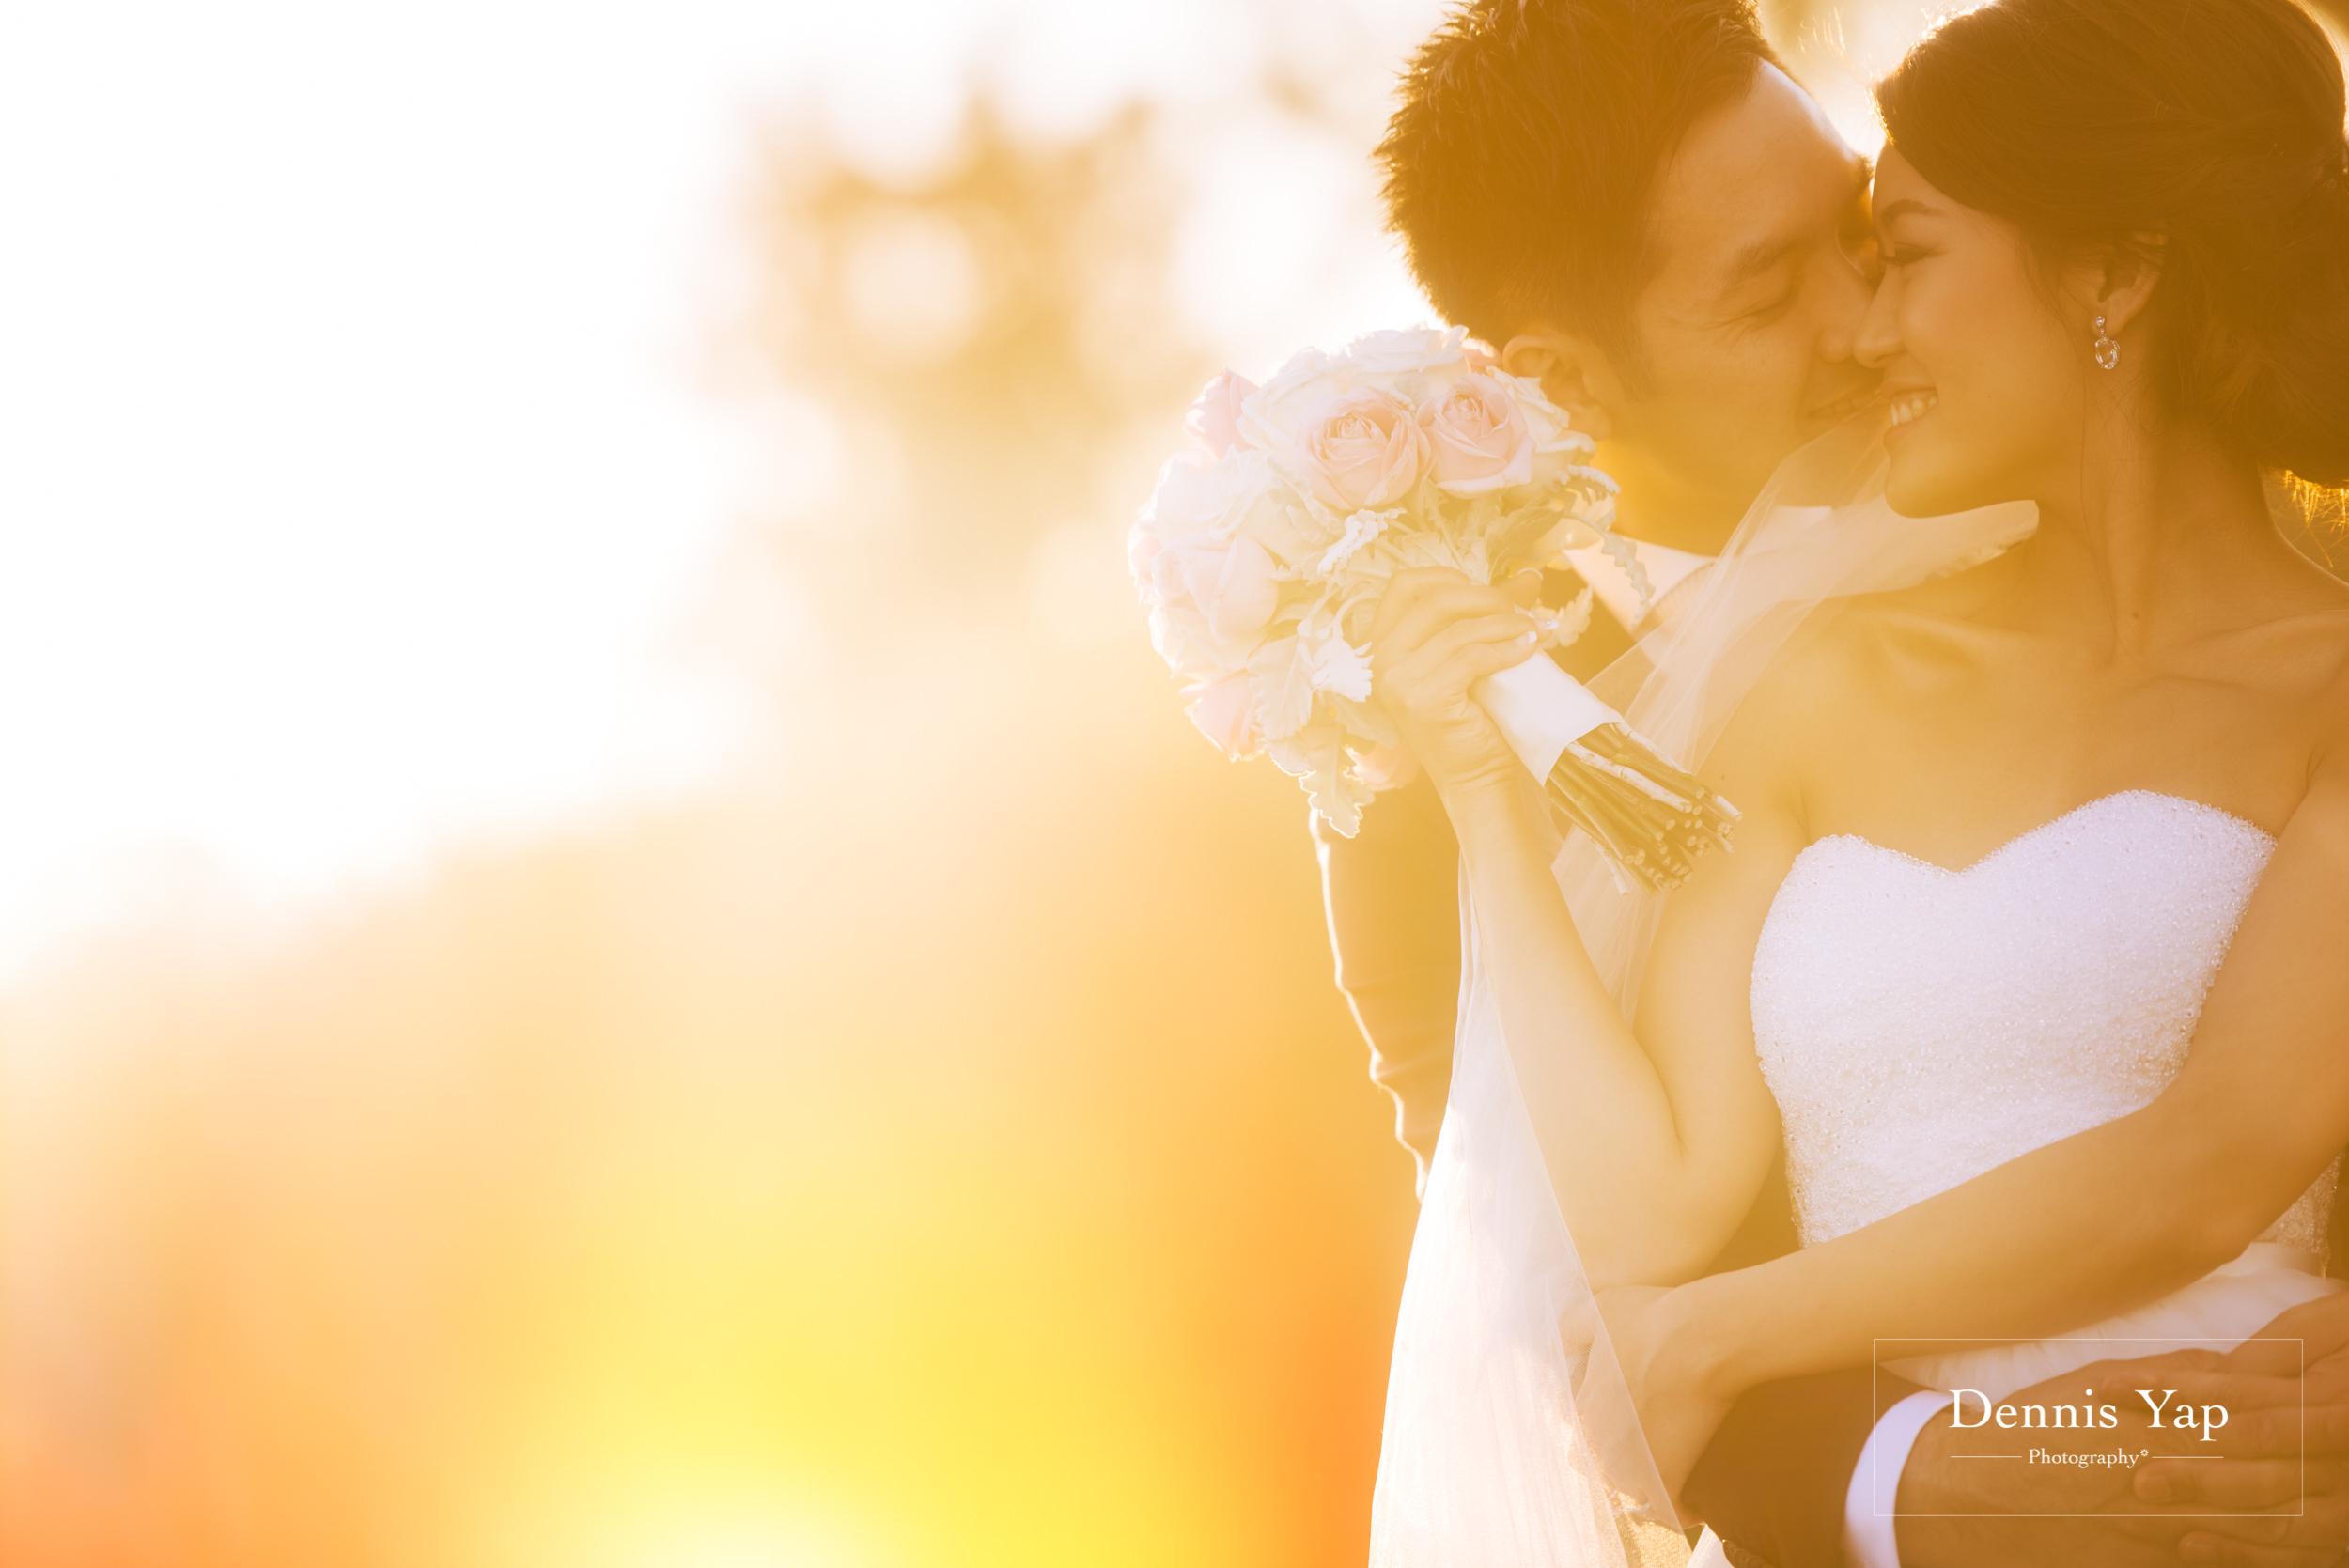 thang veng vietnamese wedding brisbane dennis yap photography malaysia wedding photographer-34.jpg